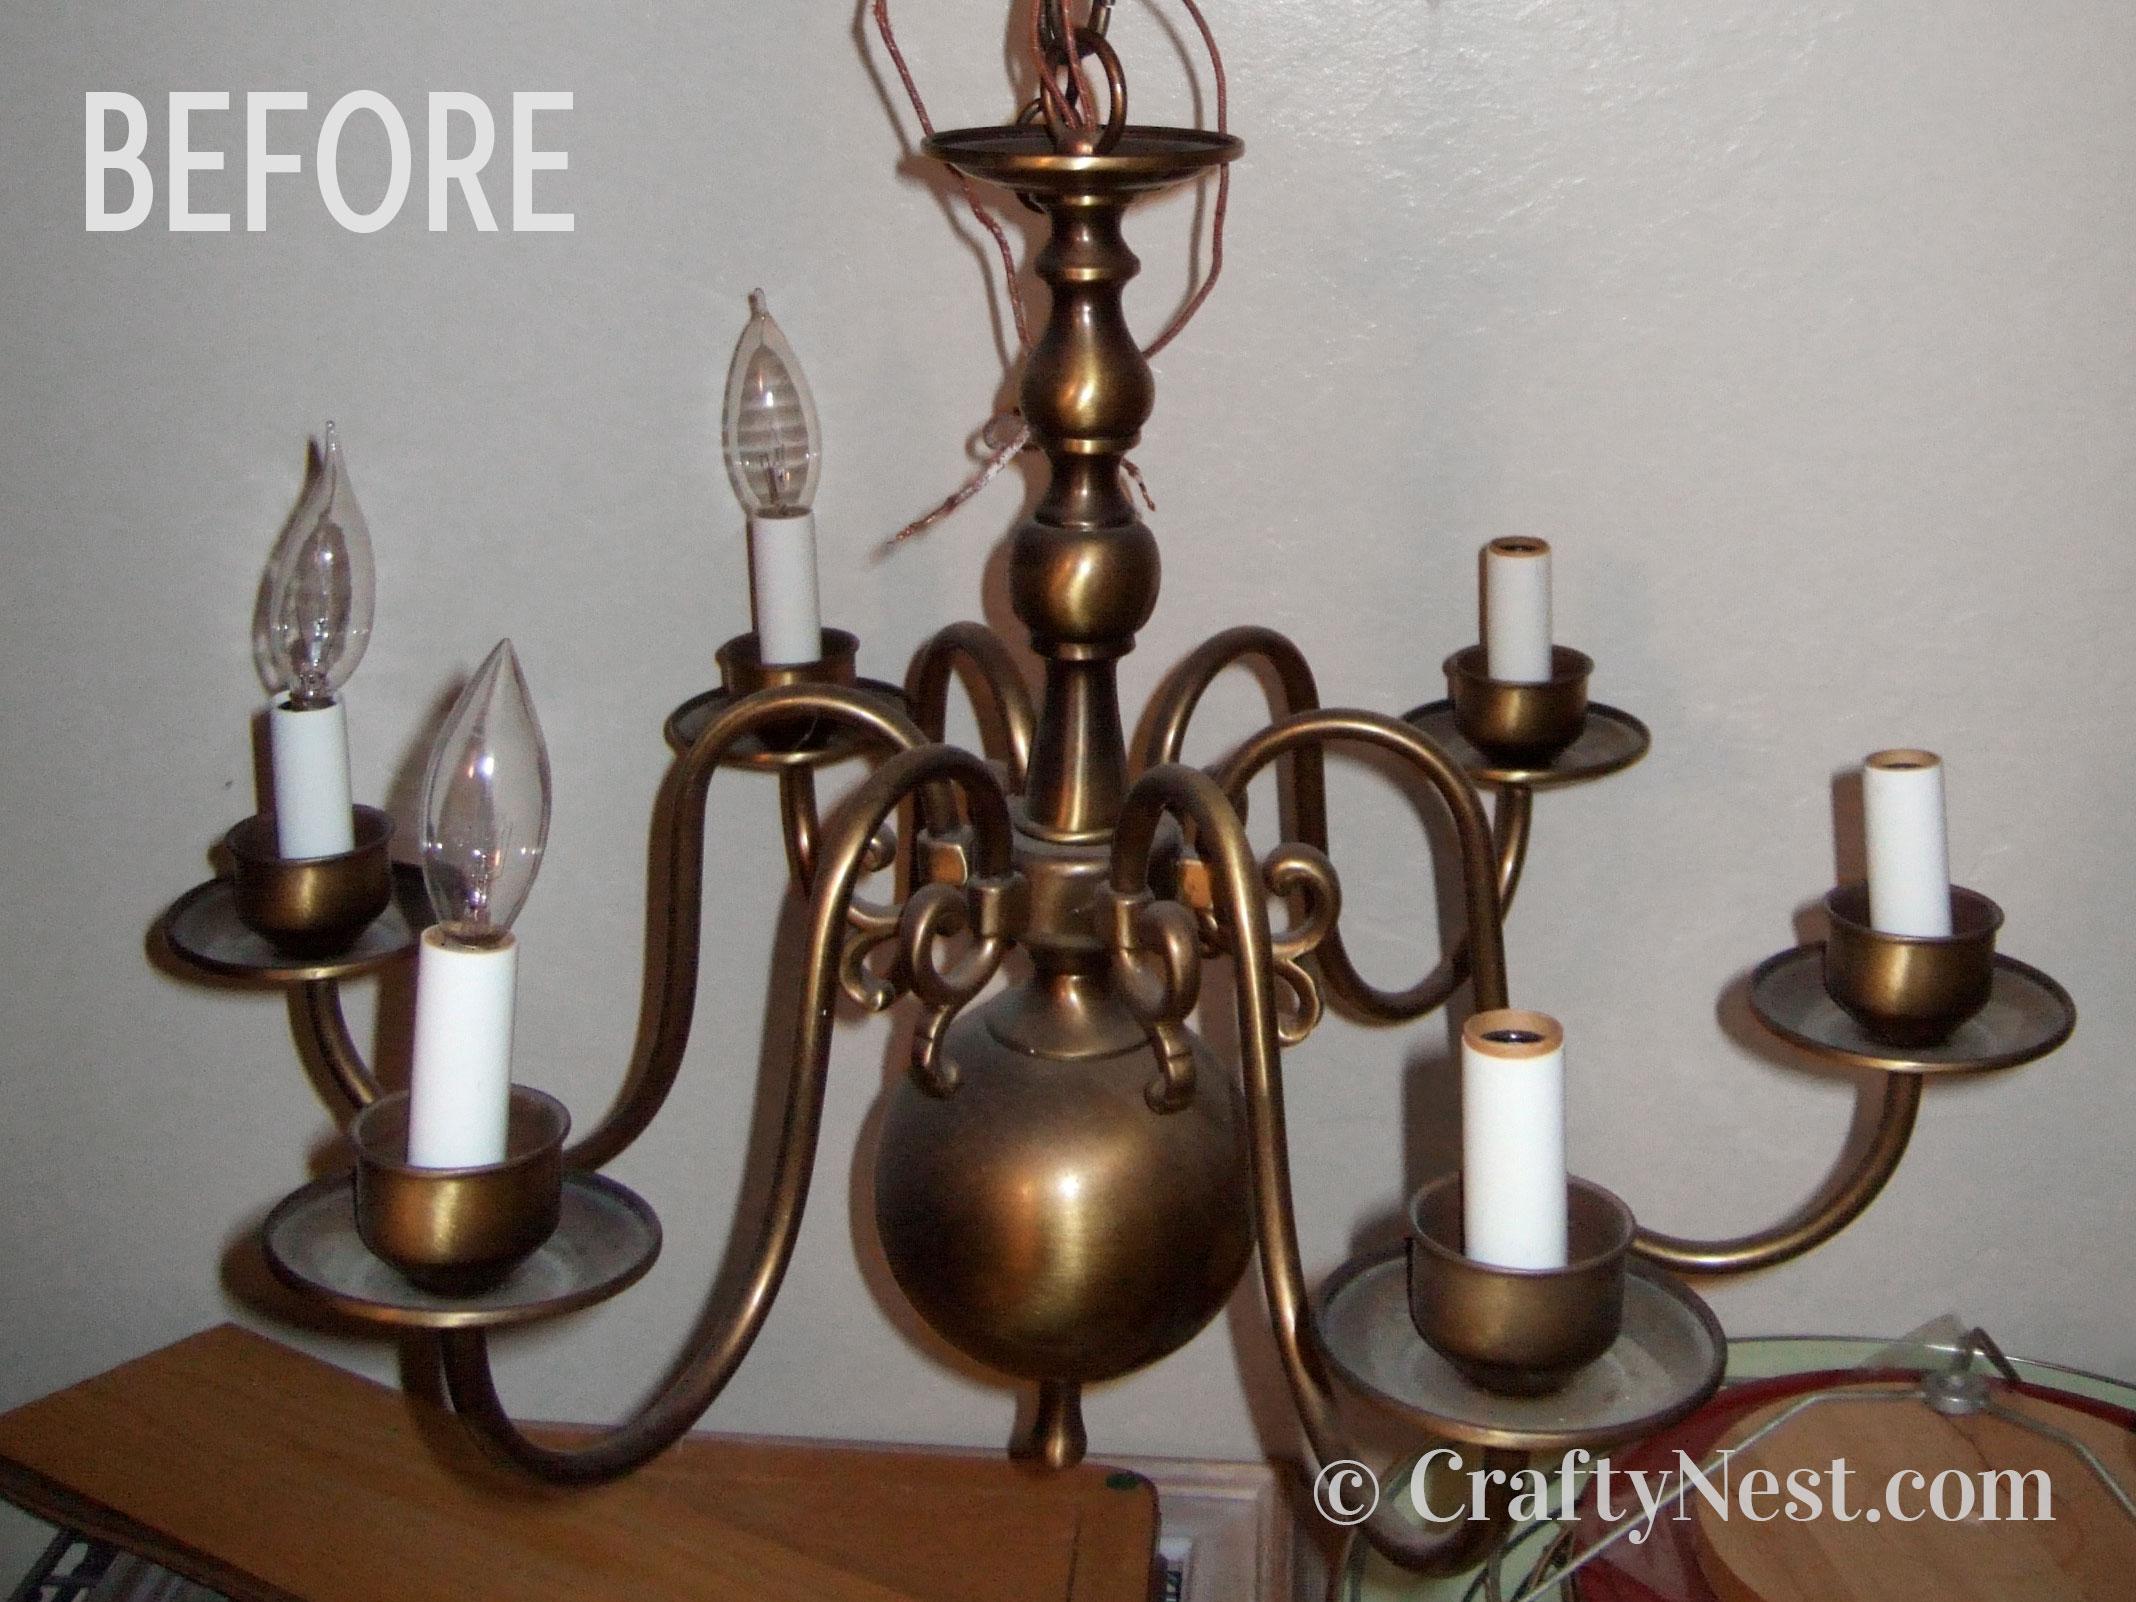 Brass chandelier, before photo